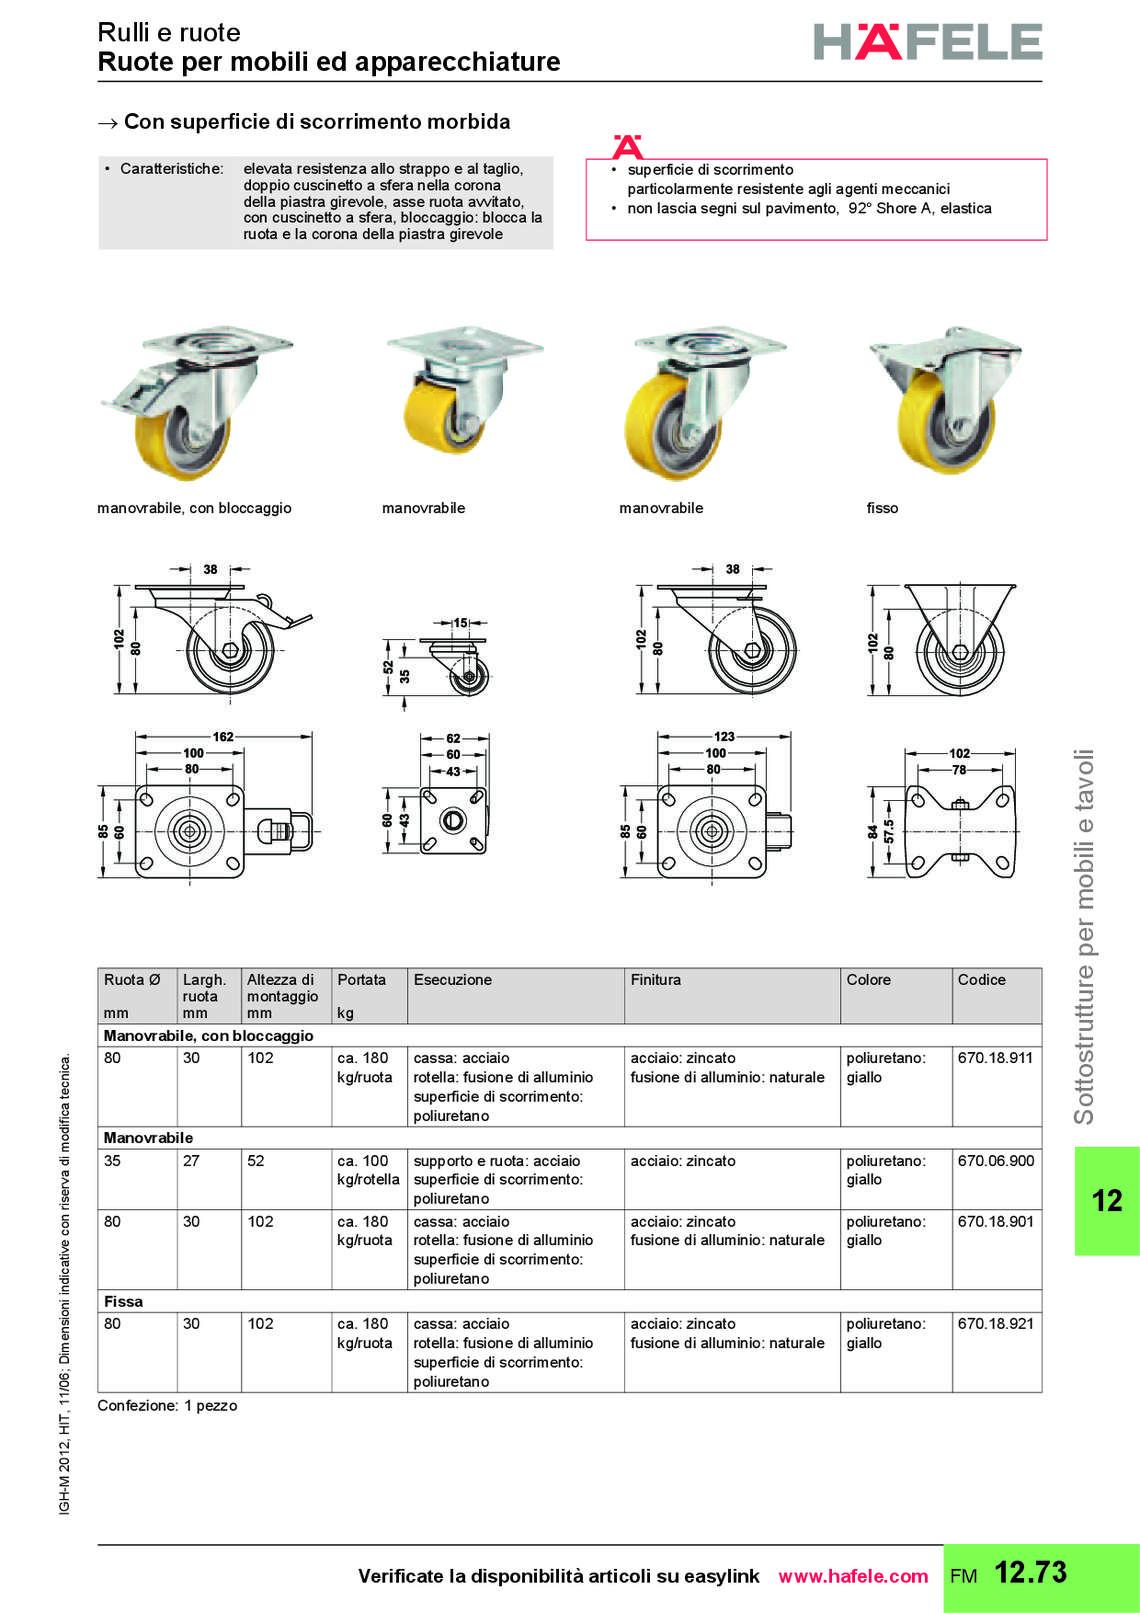 hafele-sottostrutture-per-mobili_83_096.jpg